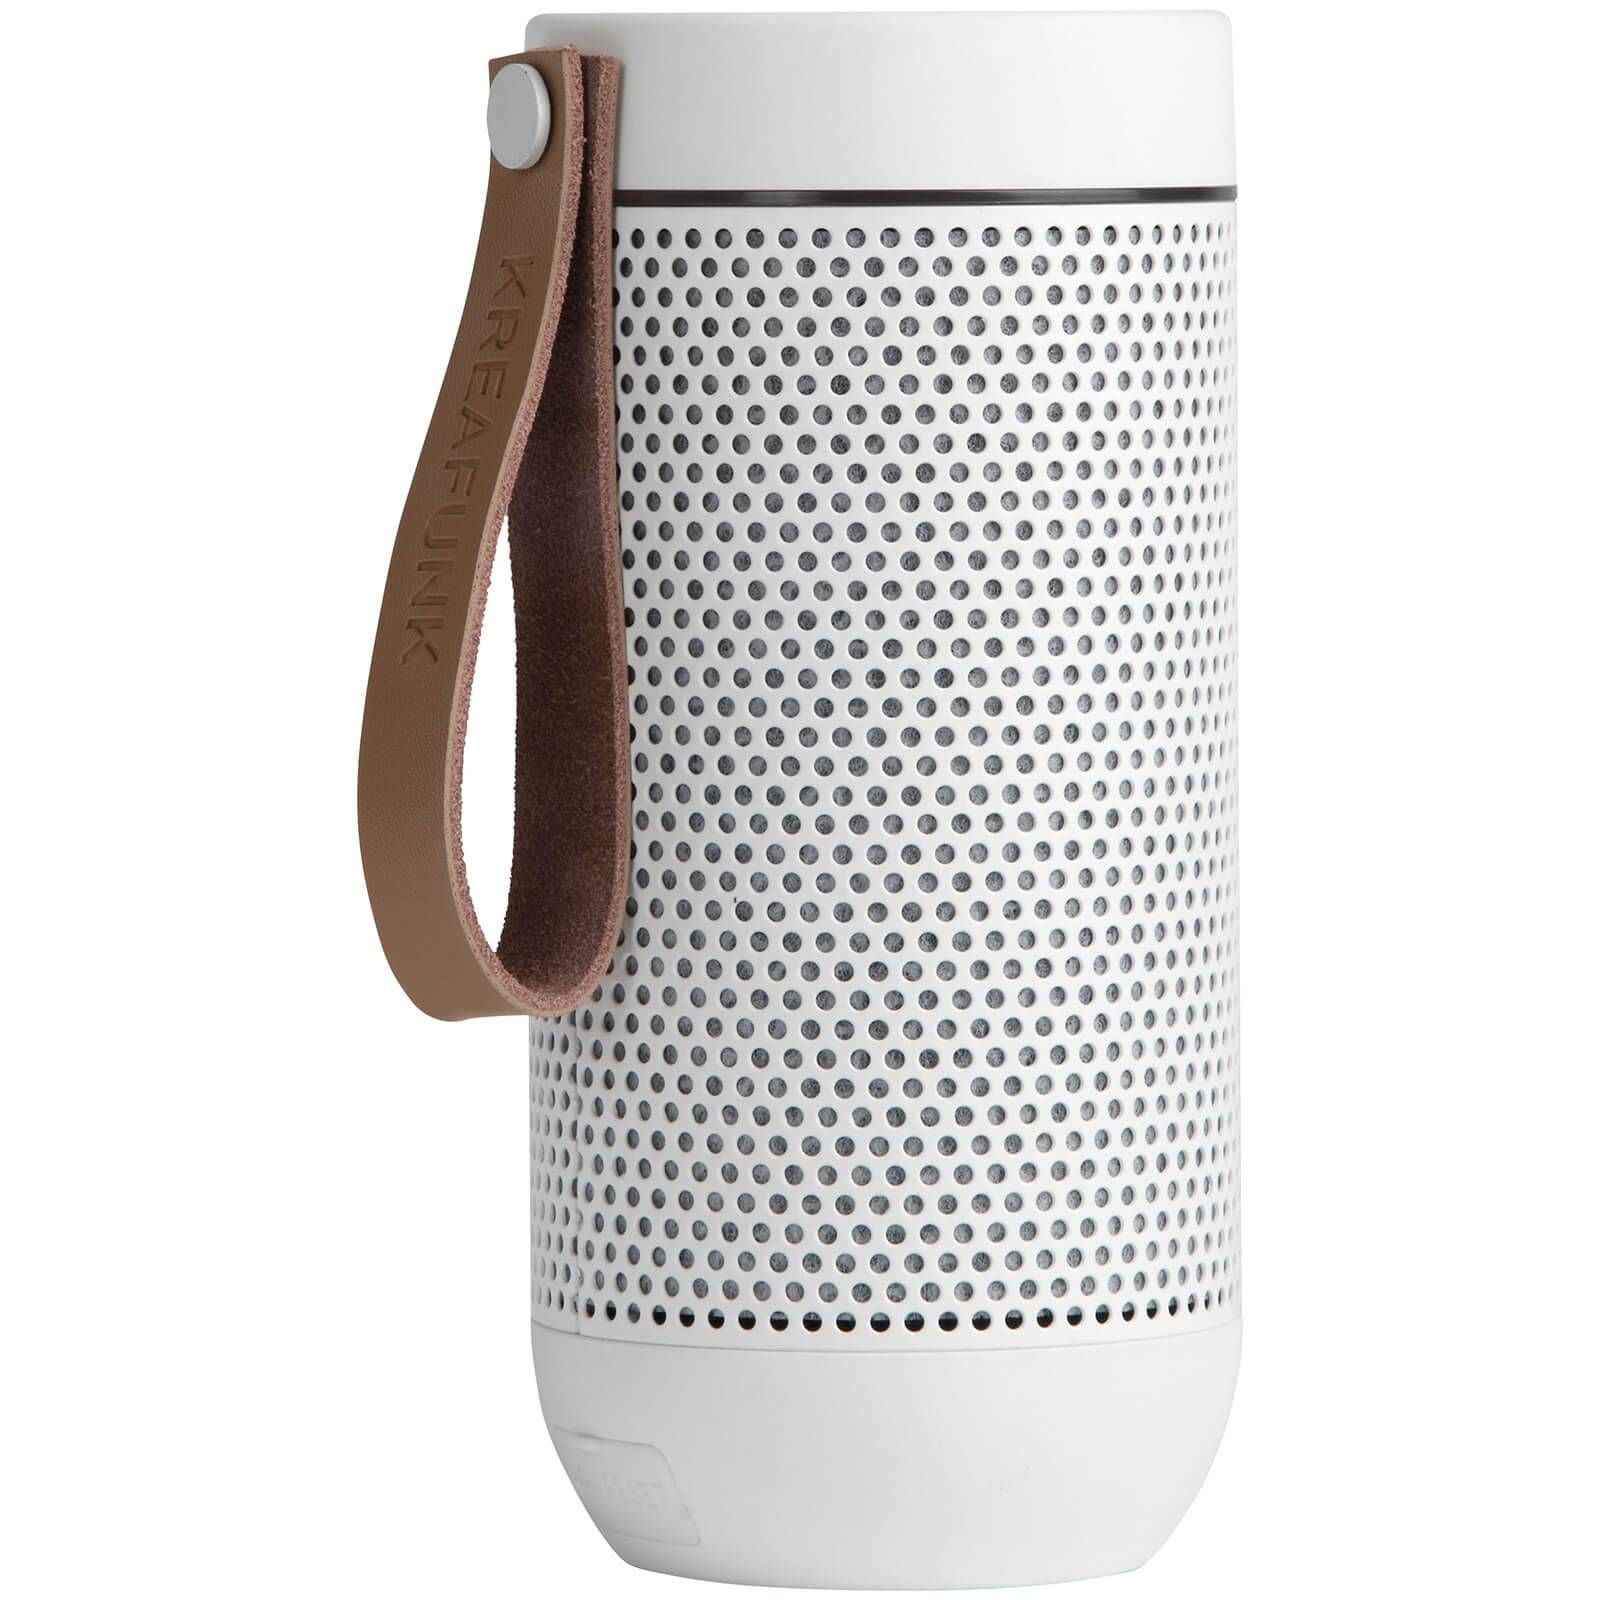 Kreafunk aFUNK 360 Degrees Bluetooth Speaker - White Edition